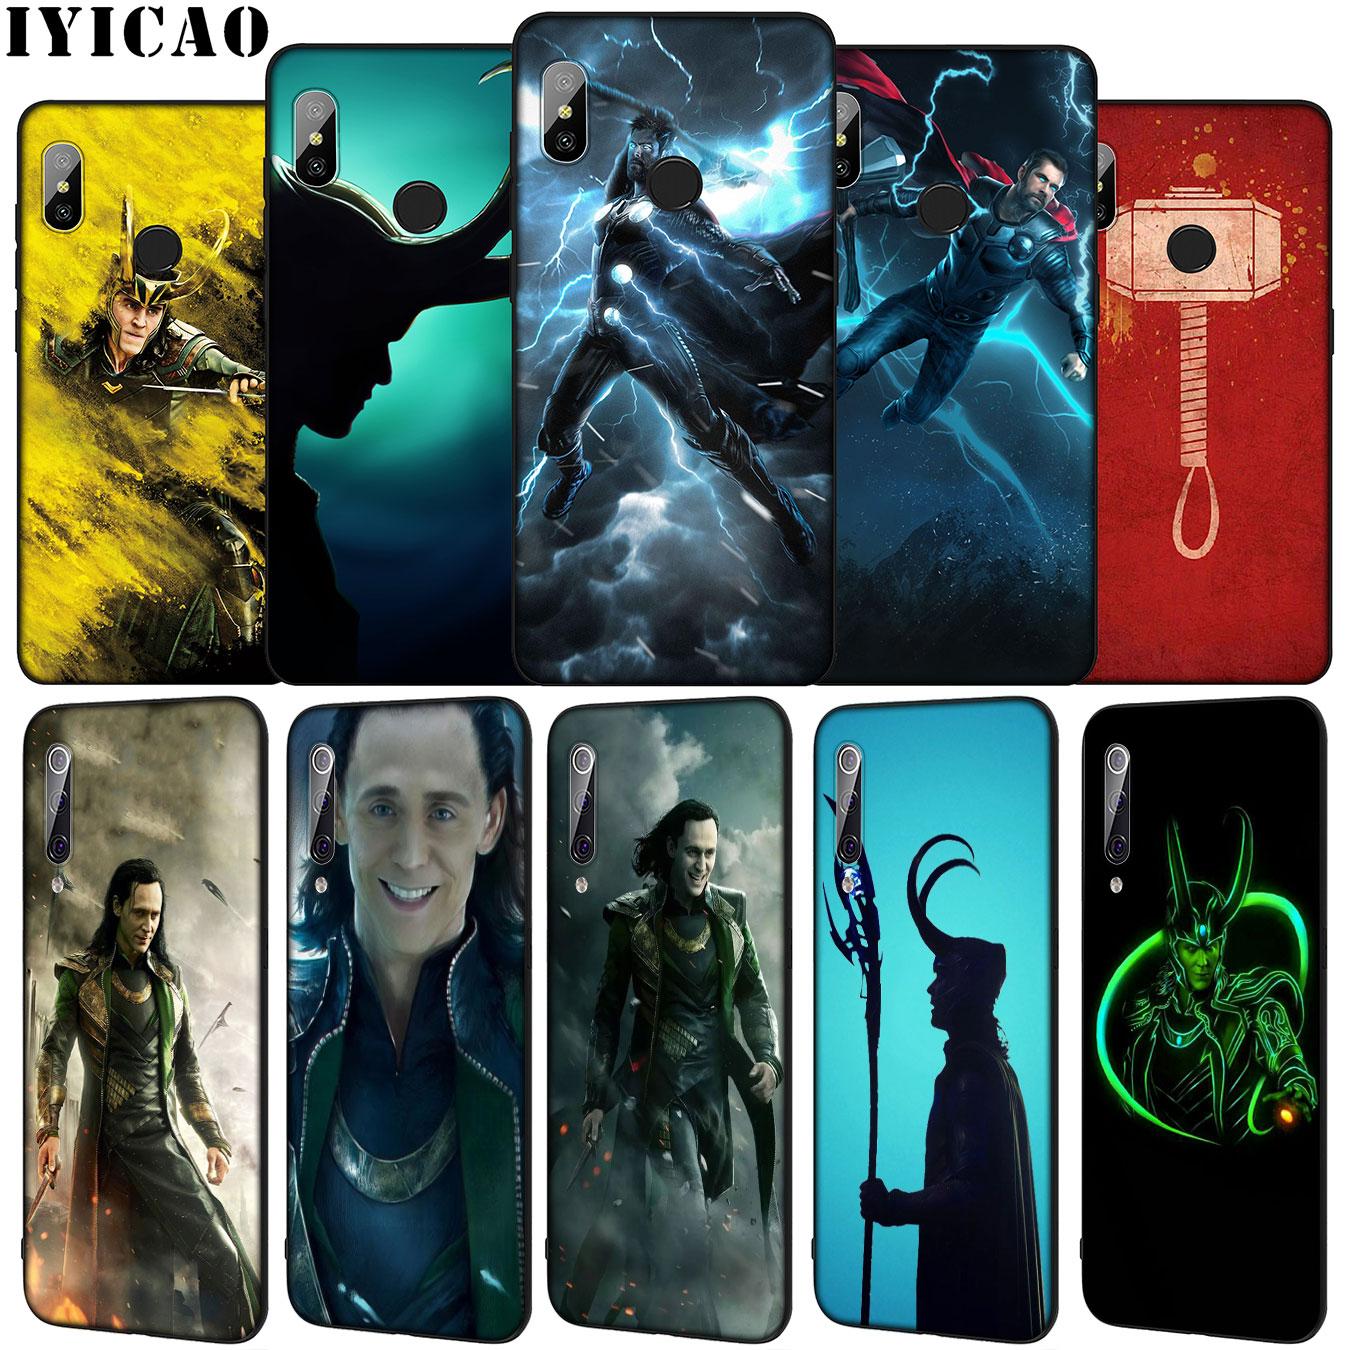 IYICAO Loki Thor Marvel Мягкий силиконовый чехол для телефона Xiaomi Mi 10 9 9T A3 Pro 8 SE A2 Lite A1 CC9 CC9E 6 pocophone f1 Mi10